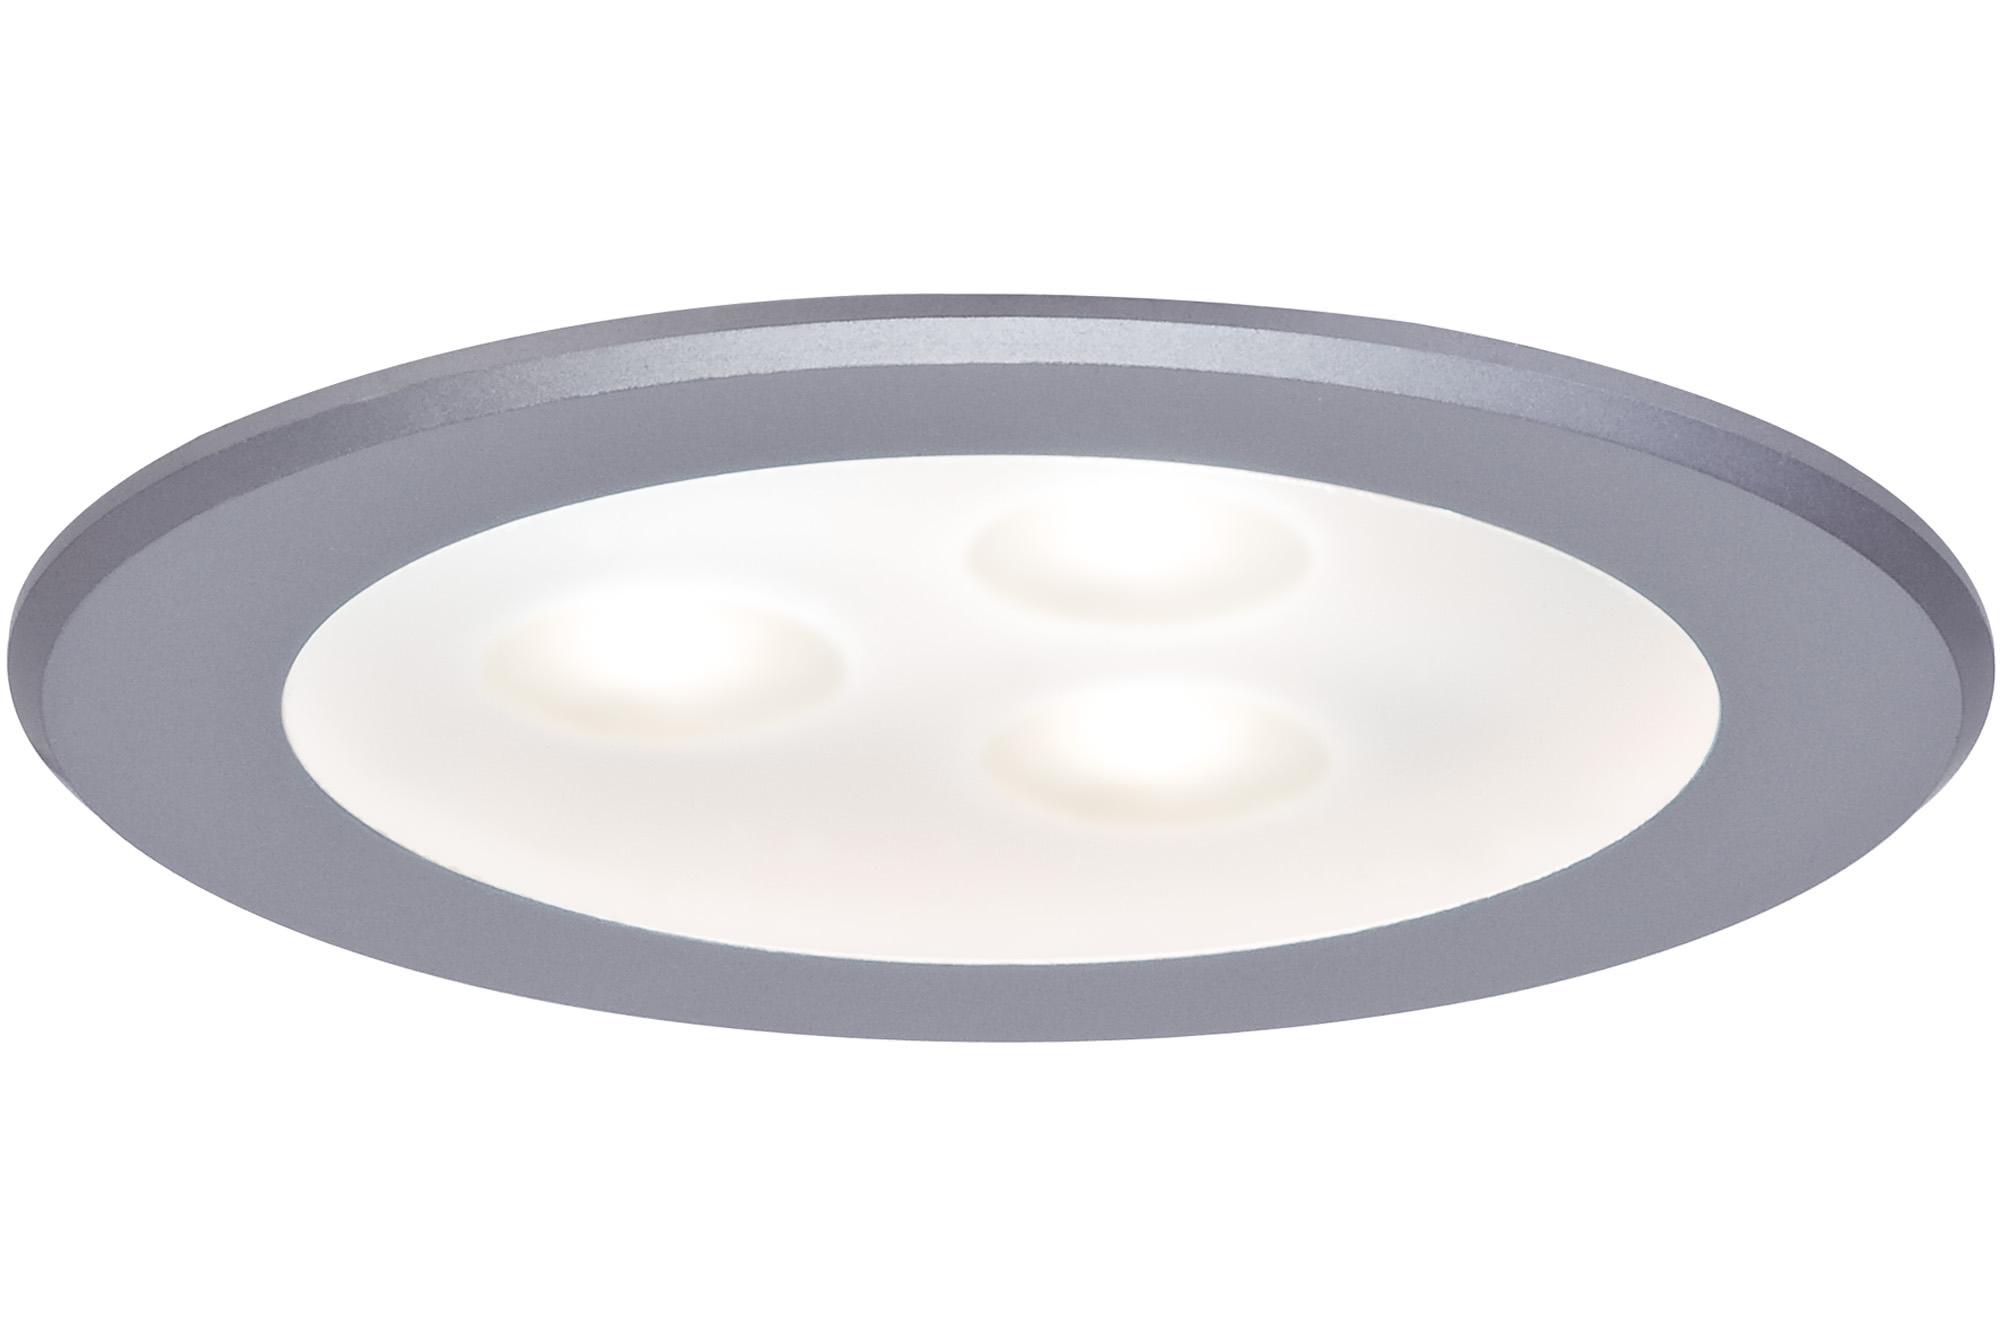 Paulmann. 93548 Светильник мебельный high power LED 1x3W 3VA, хром матовый